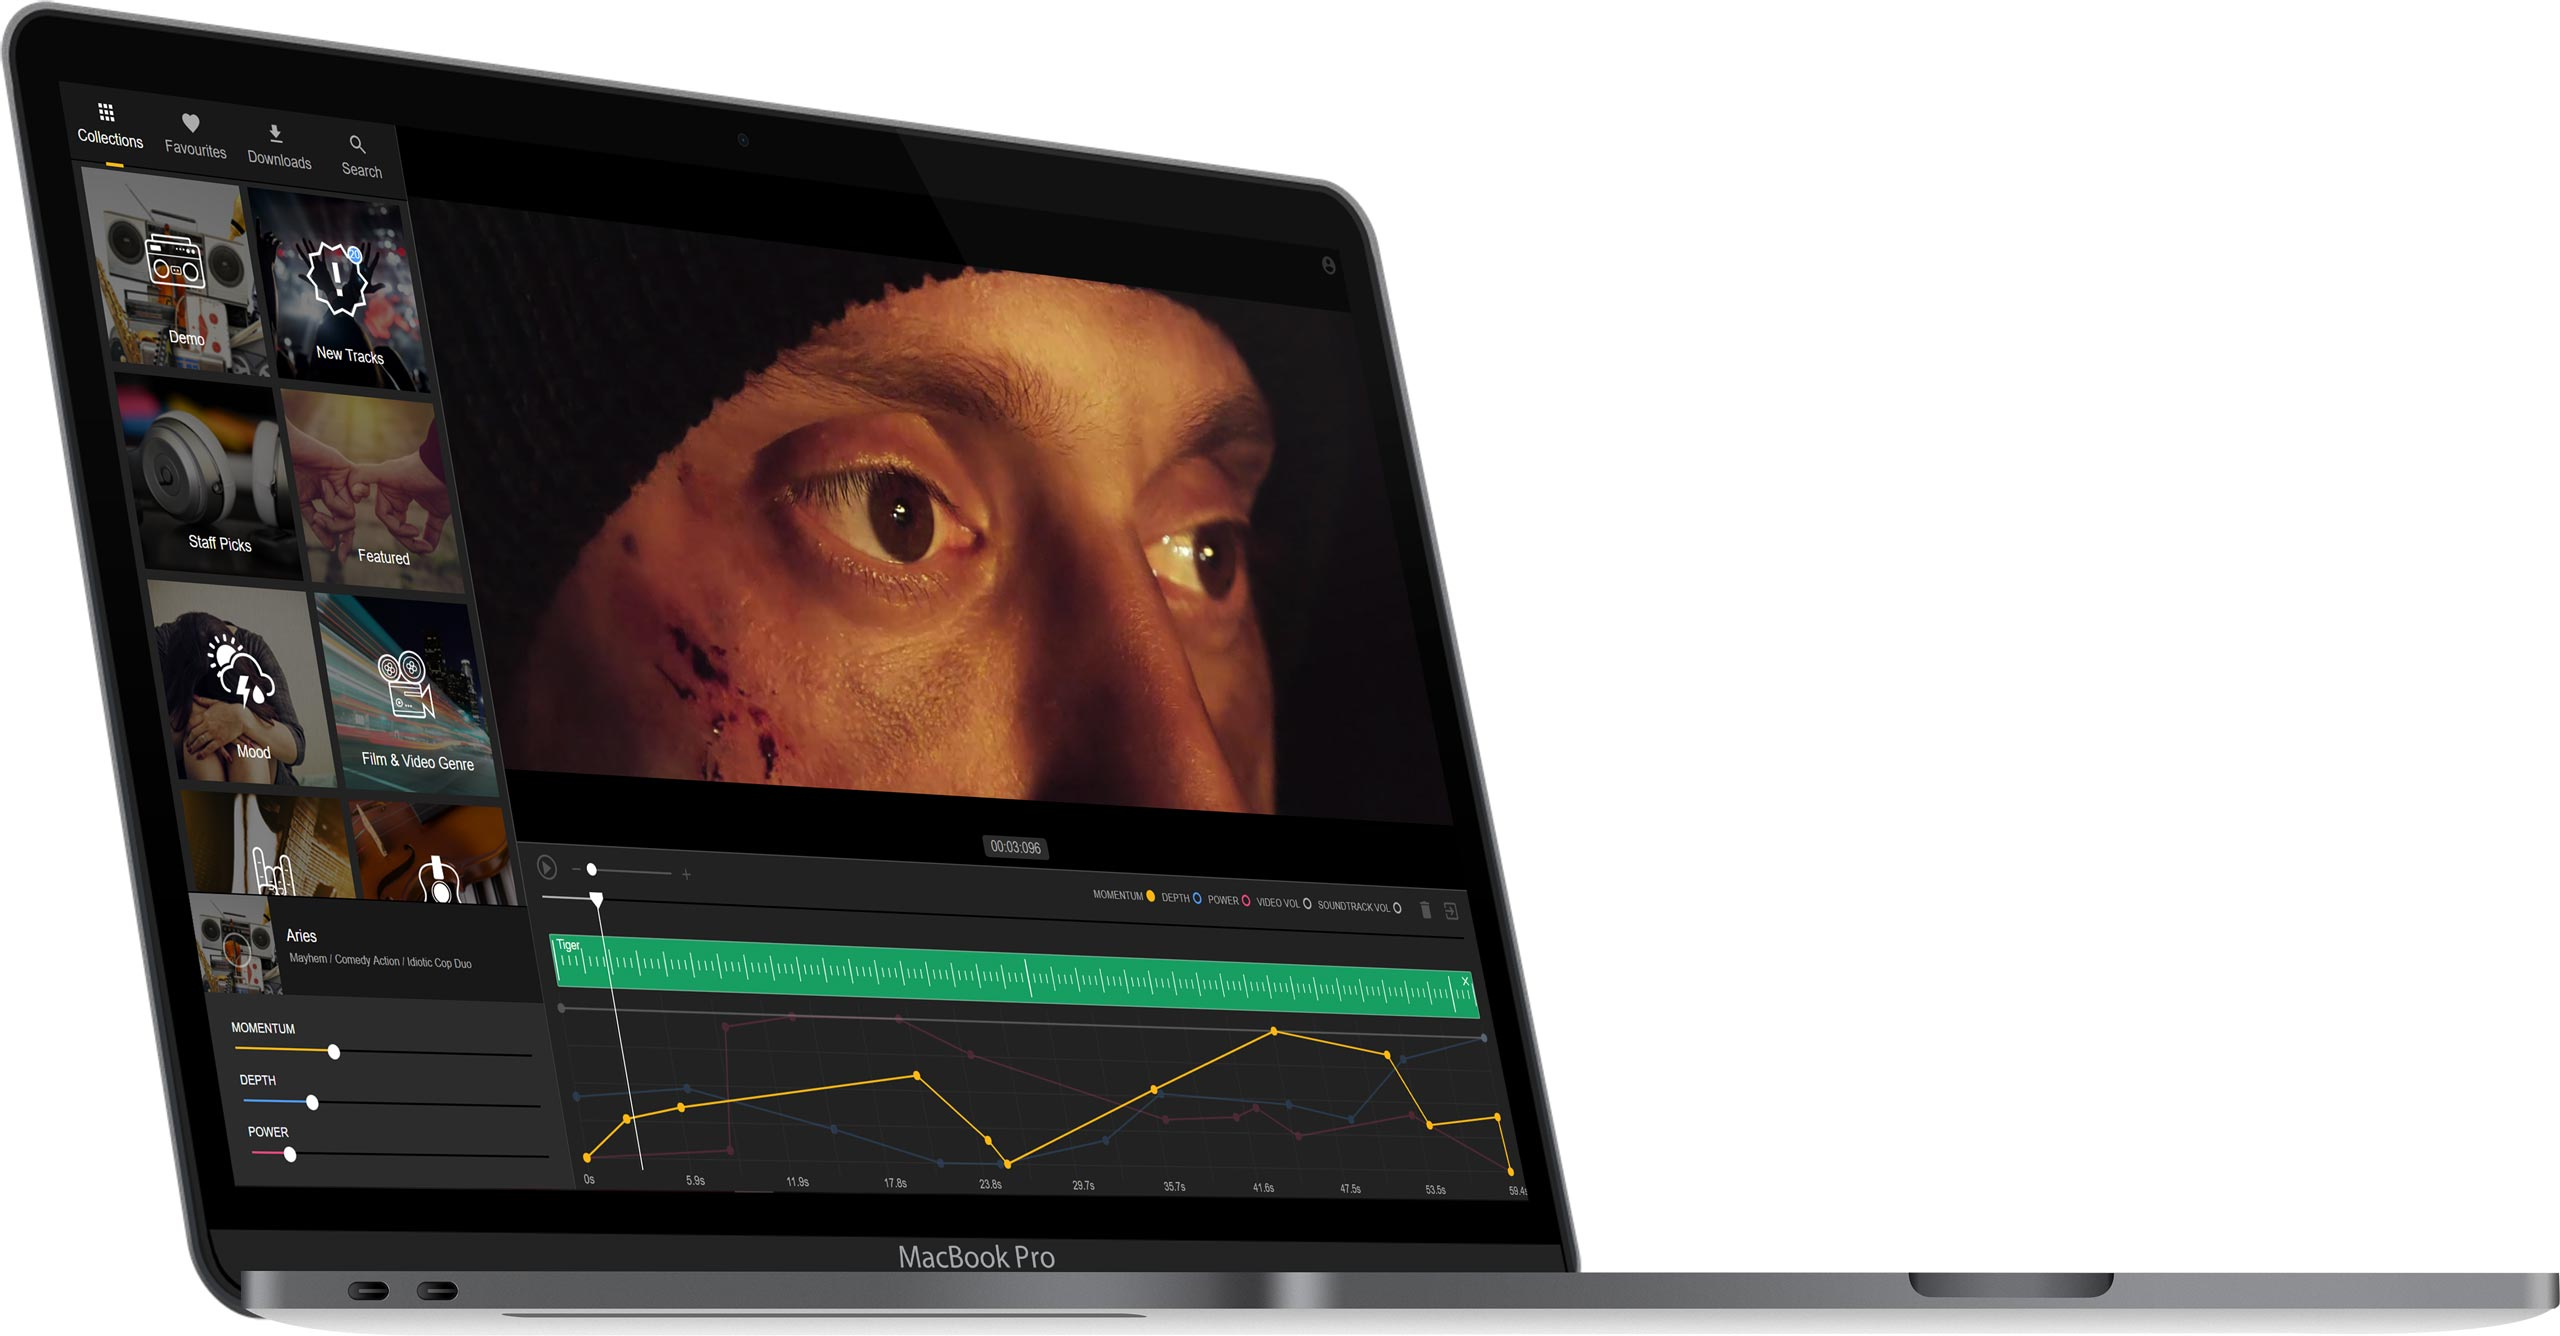 Filmstro interface on laptop with Oli Thompson close-up action movie